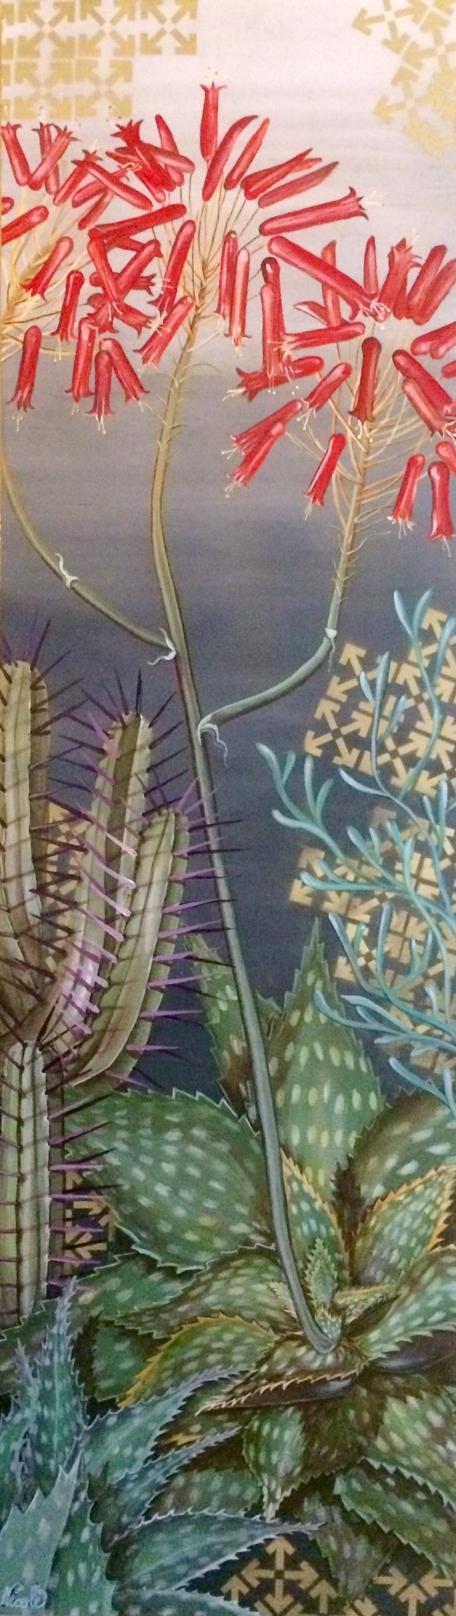 Zebra Aloe & Euphorbia